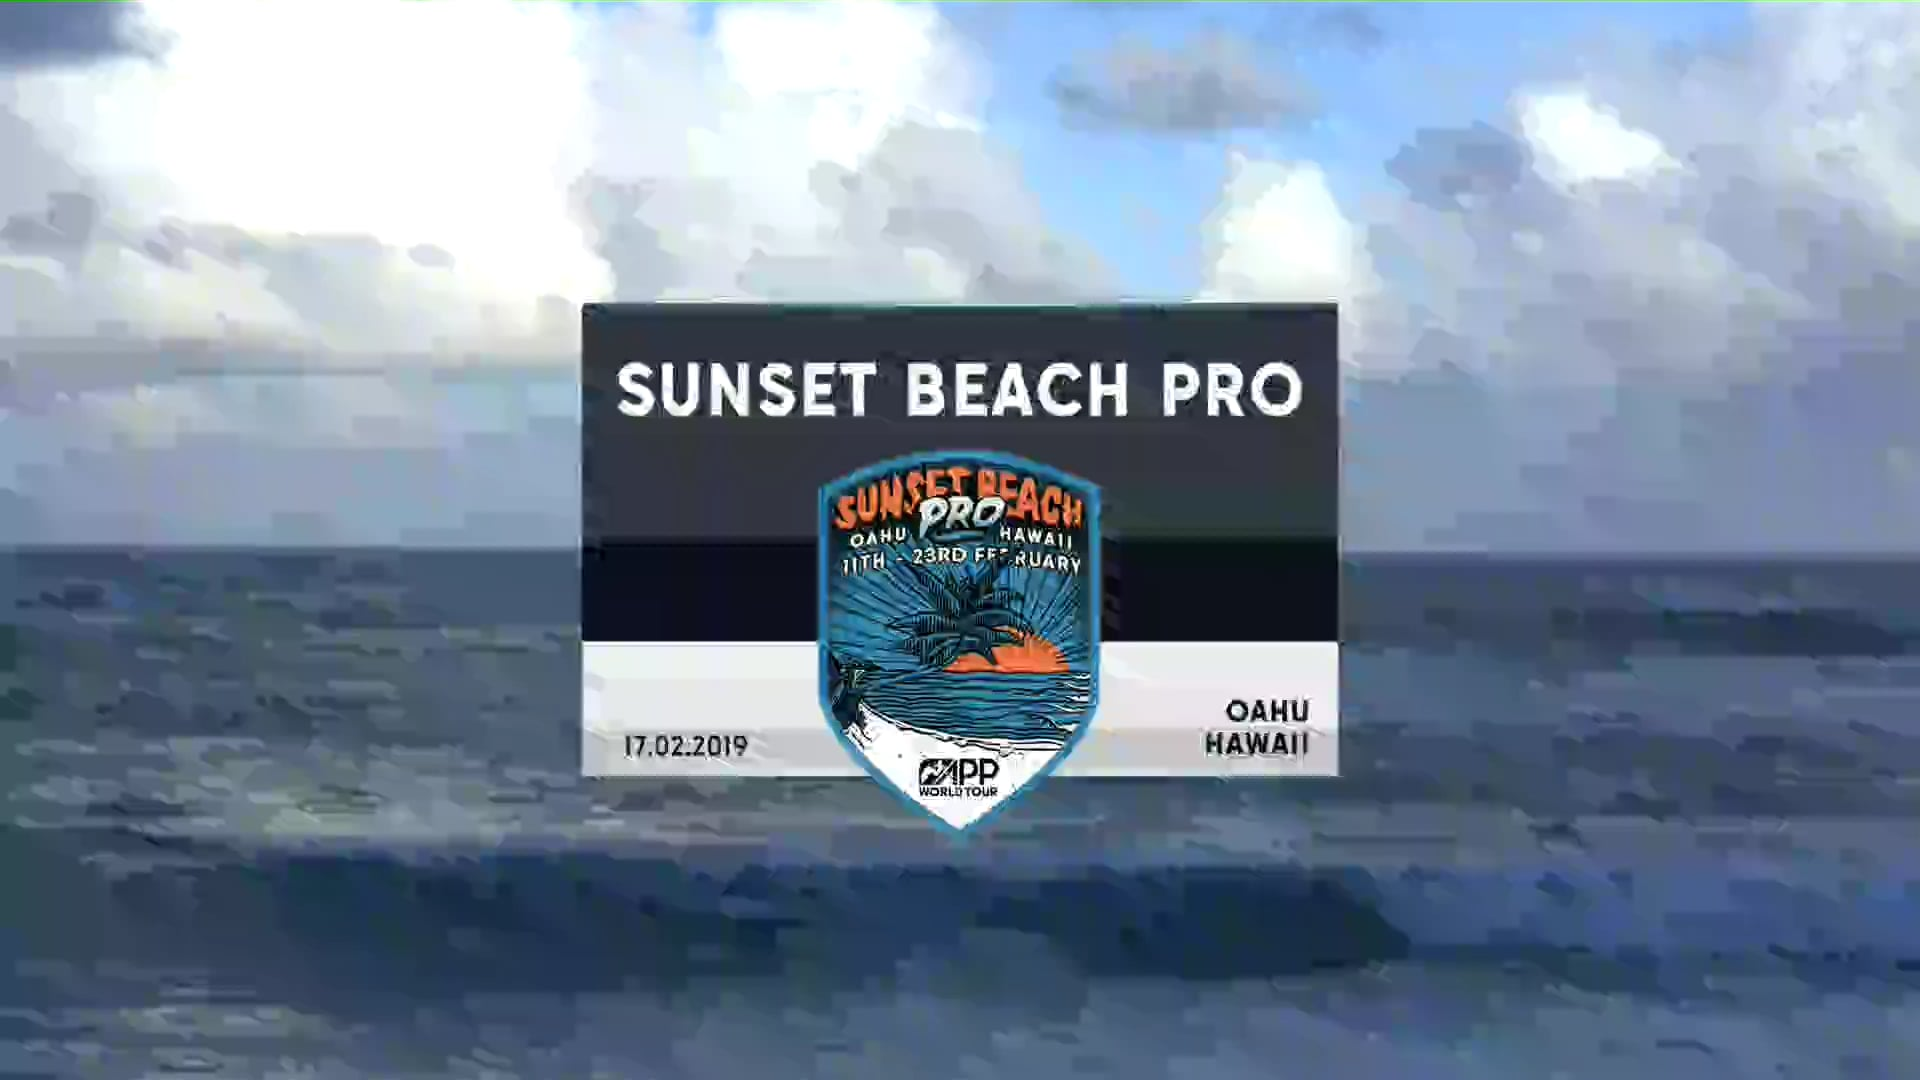 Sunset Beach Pro 2019 - DAY 2 - PART 1  - FULL BROADCAST